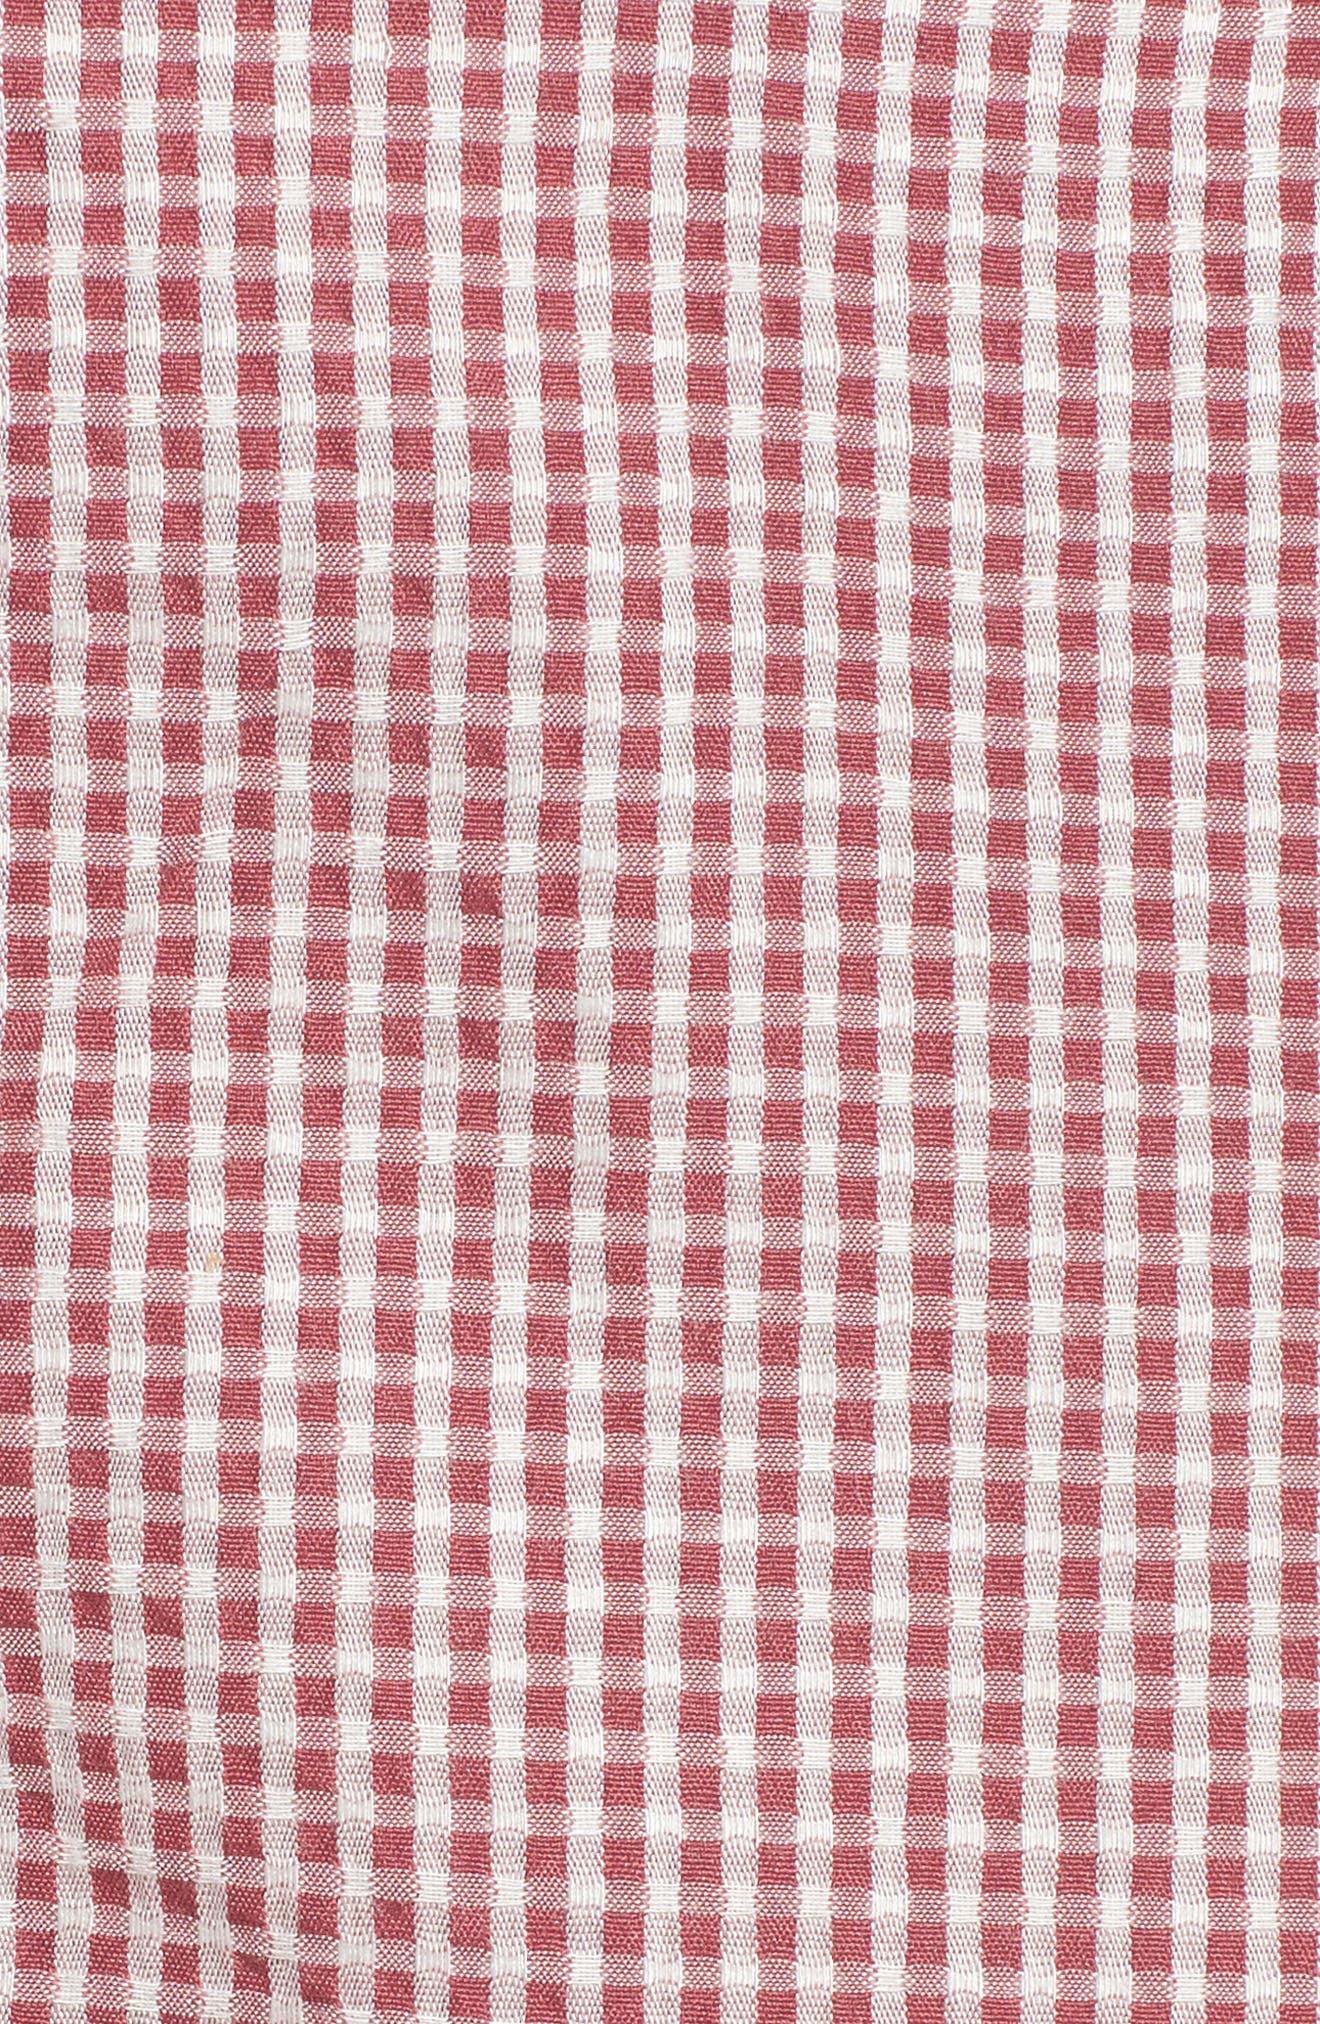 Pisa High Waist Crop Pants,                             Alternate thumbnail 6, color,                             RED GINGHAM